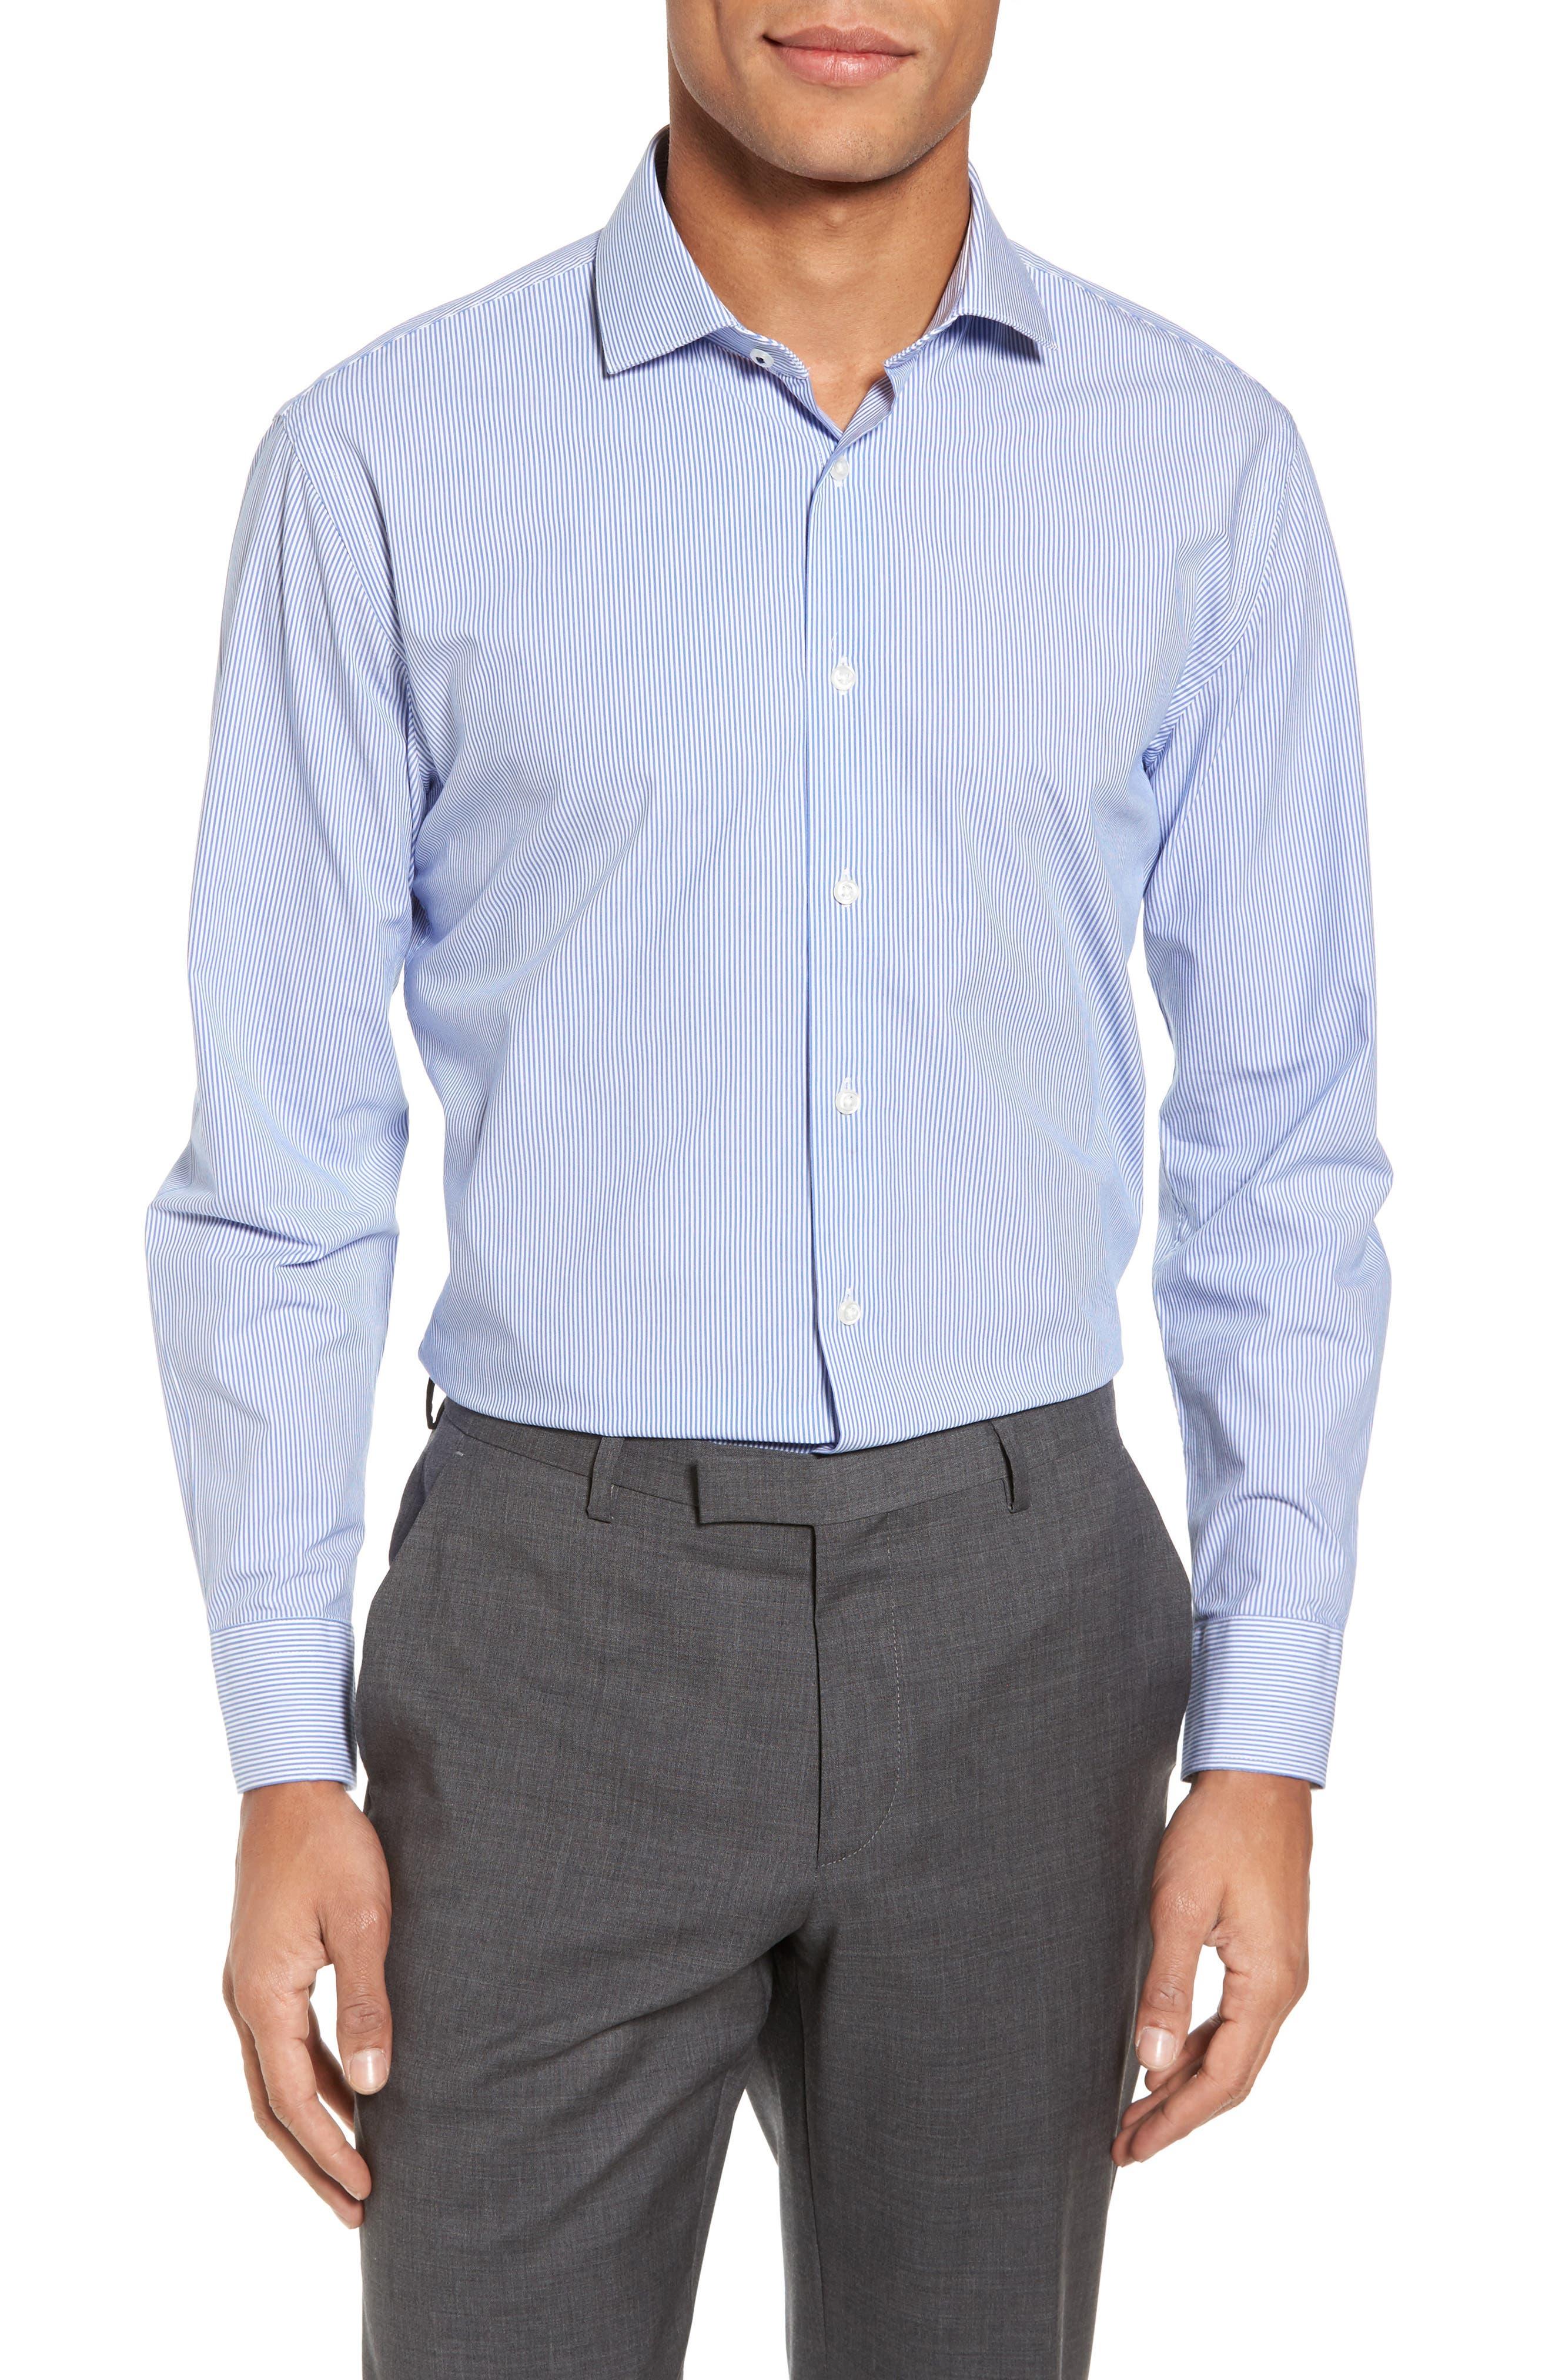 Tech-Smart Trim Fit Stretch Stripe Dress Shirt,                             Main thumbnail 1, color,                             420